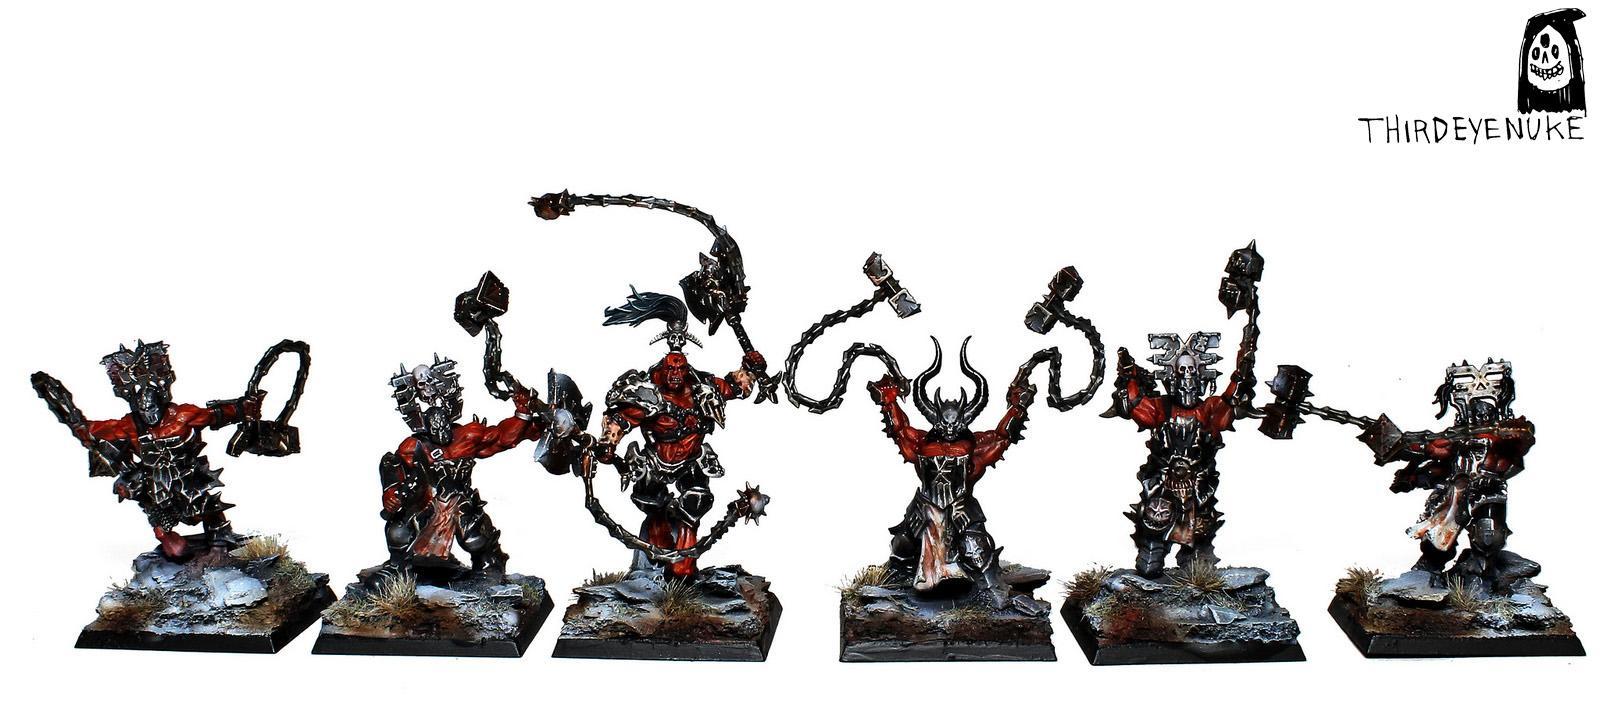 Chaos, Khorne Wrathmongers, Thirdeyenuke, Warhammer Fantasy, Warriors